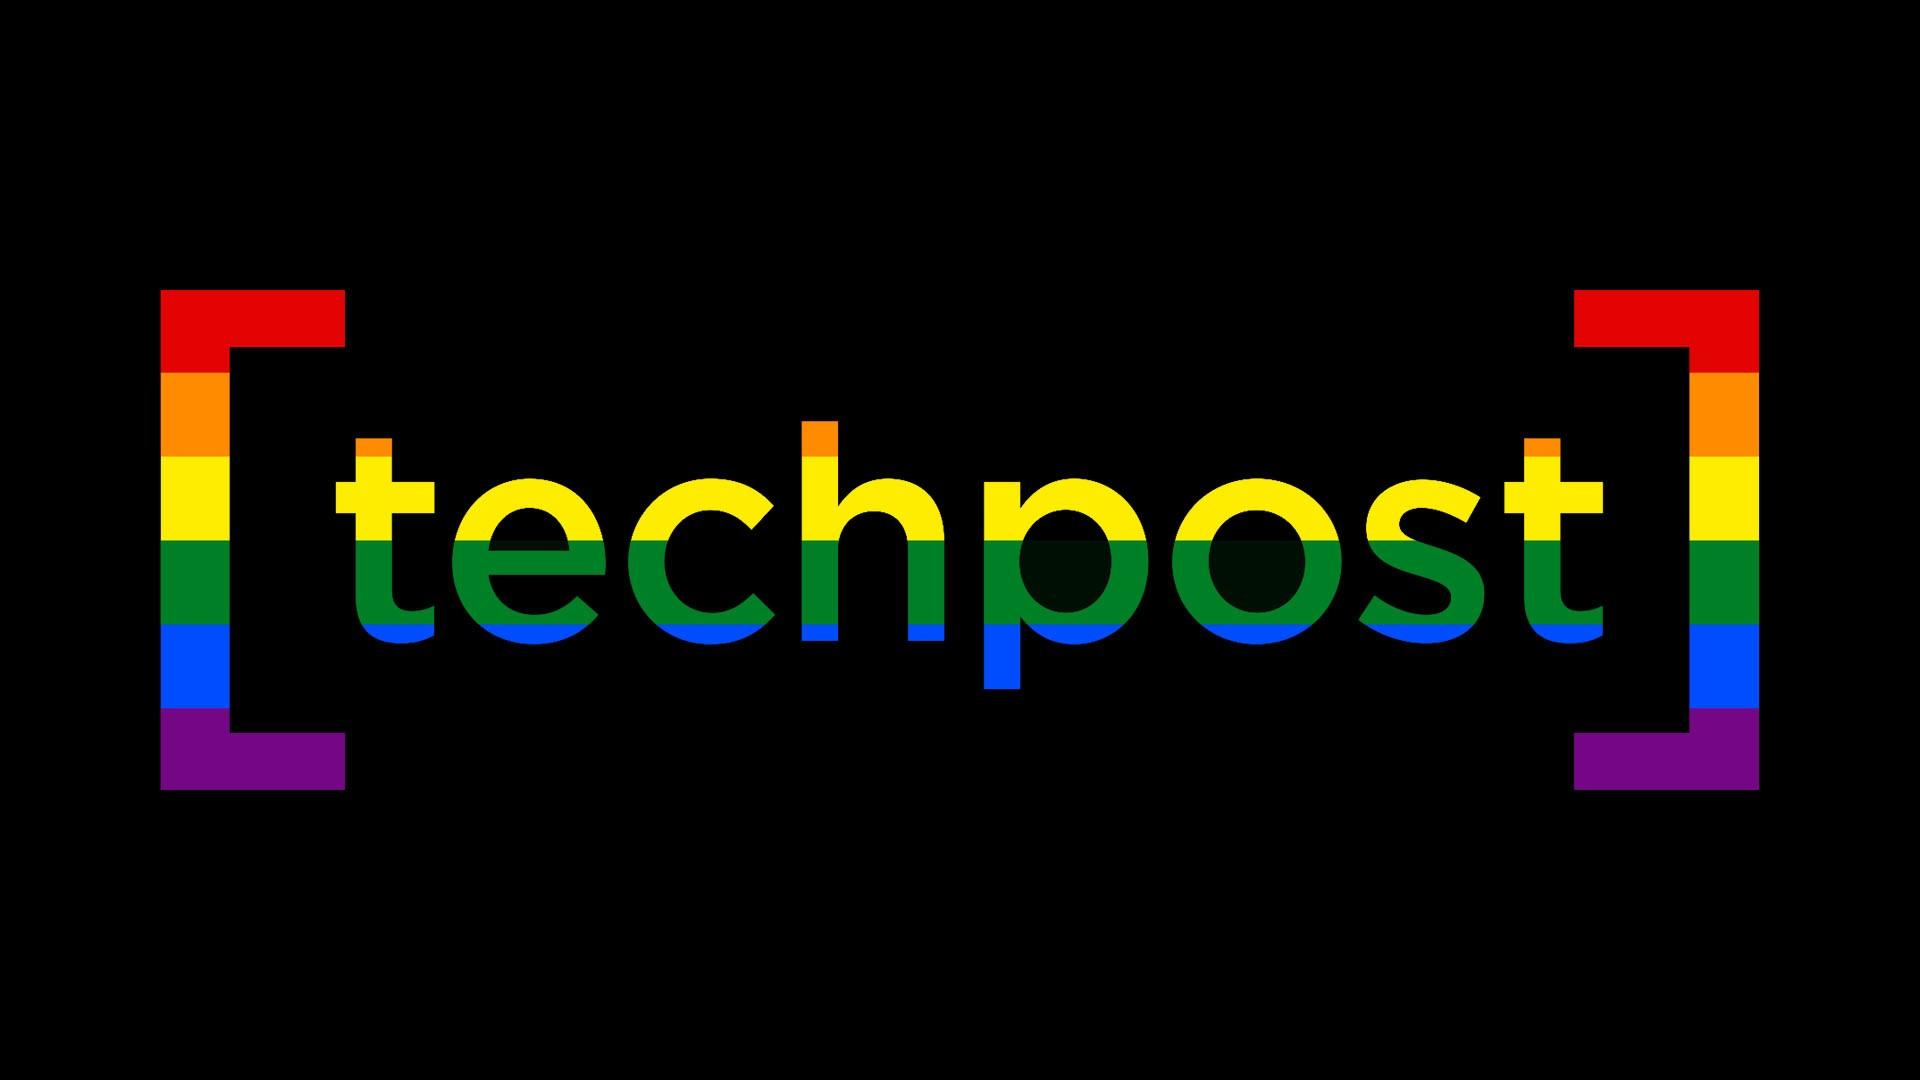 Techpost LGBT